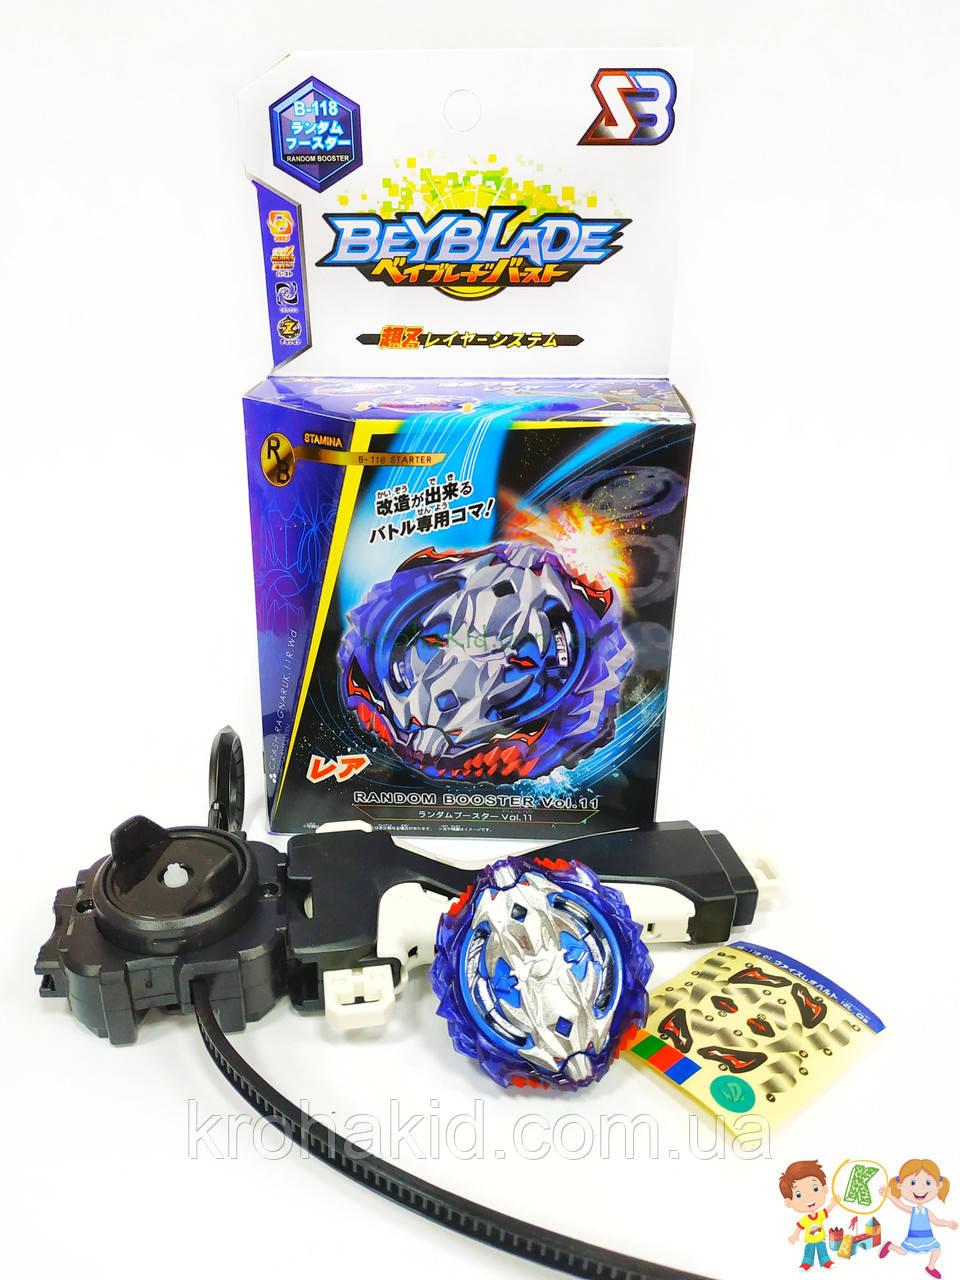 Игрушка BeyBlade Vise Leopard B-118 / Бейблэйд Вайс Леопард (синий) SB